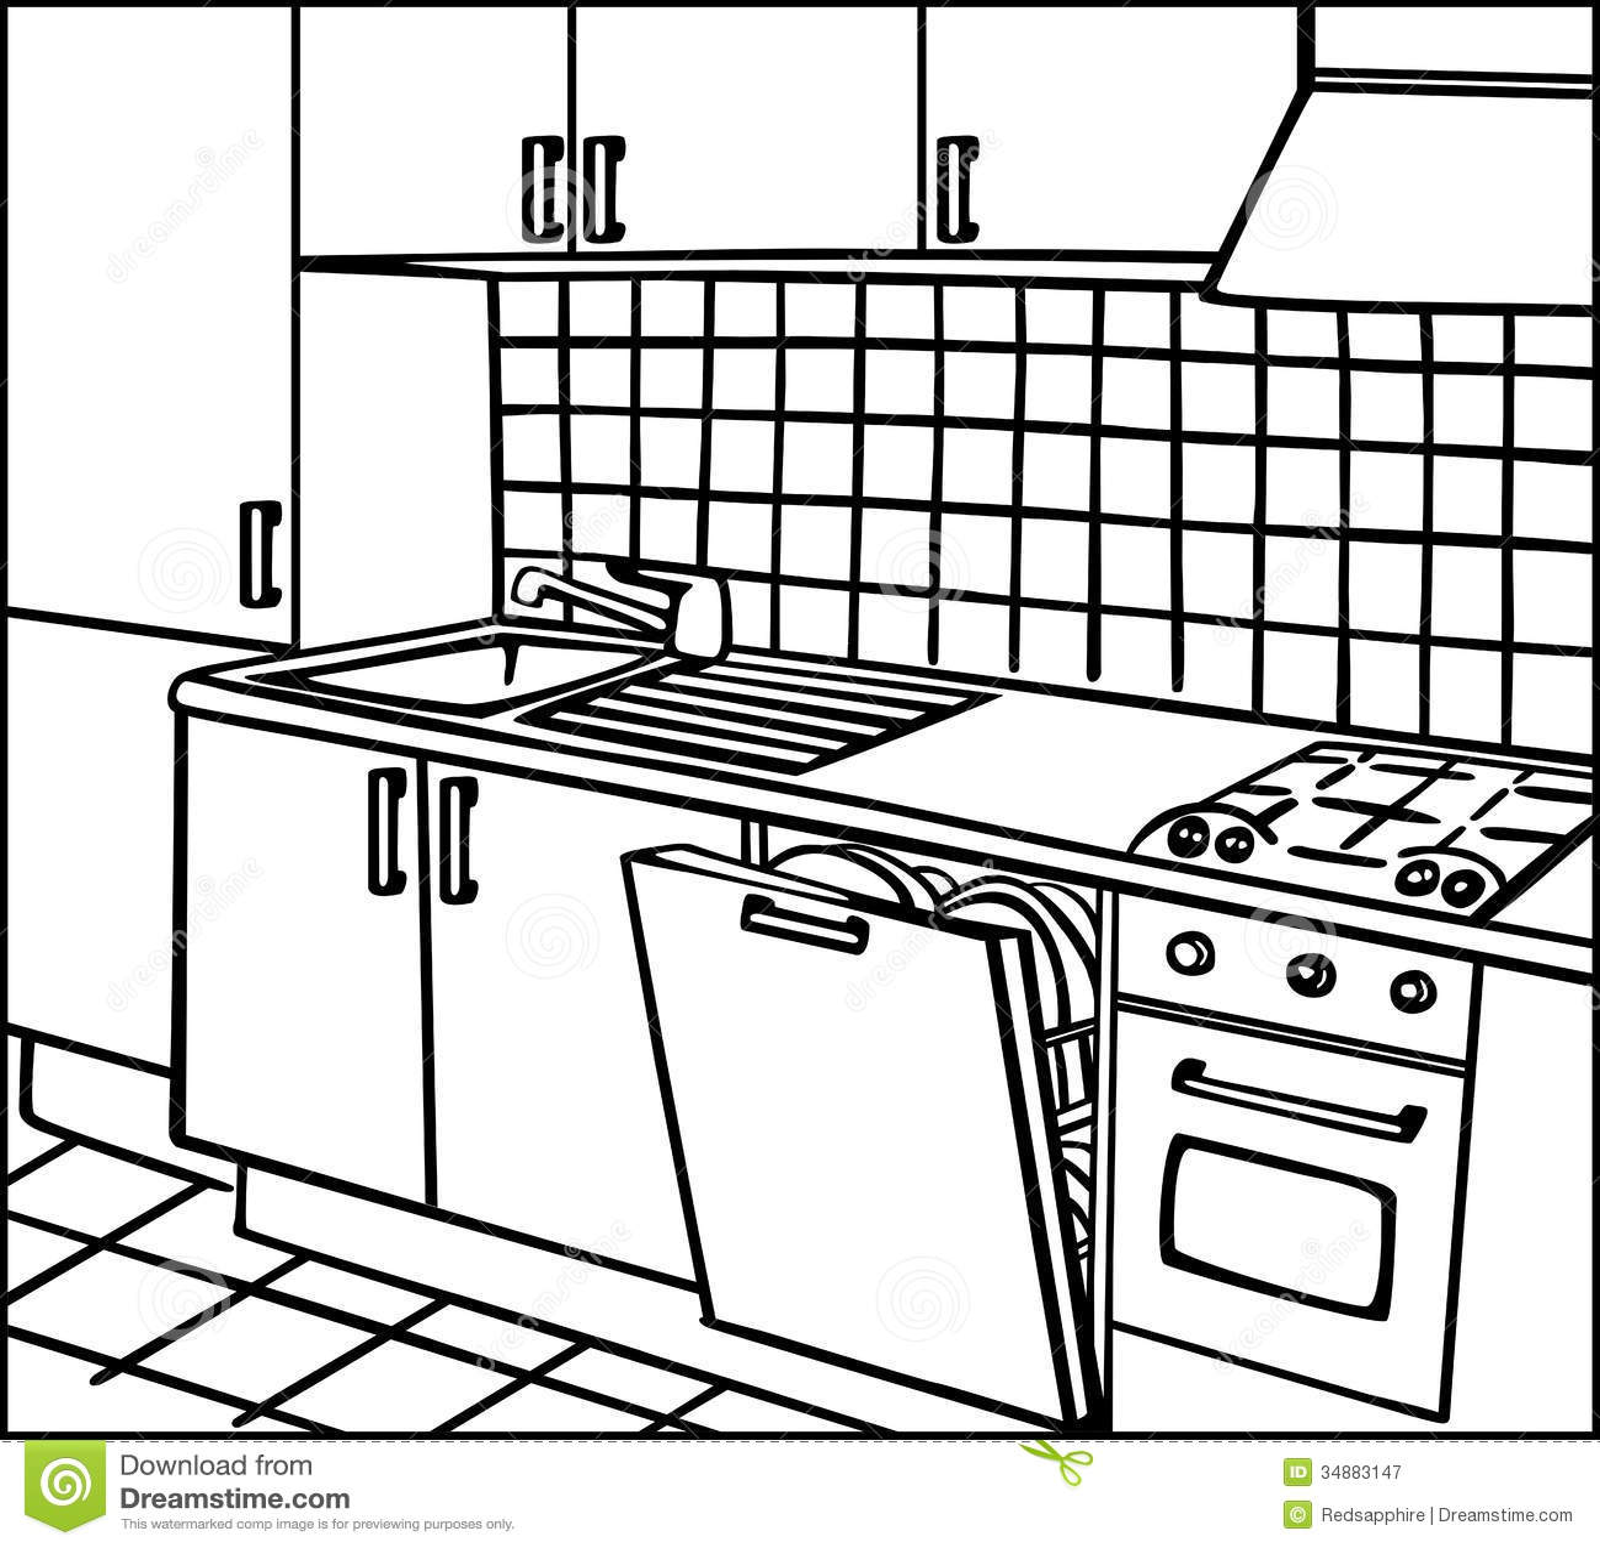 Line Art Vector Illustrator : Kitchen royalty free stock photography image